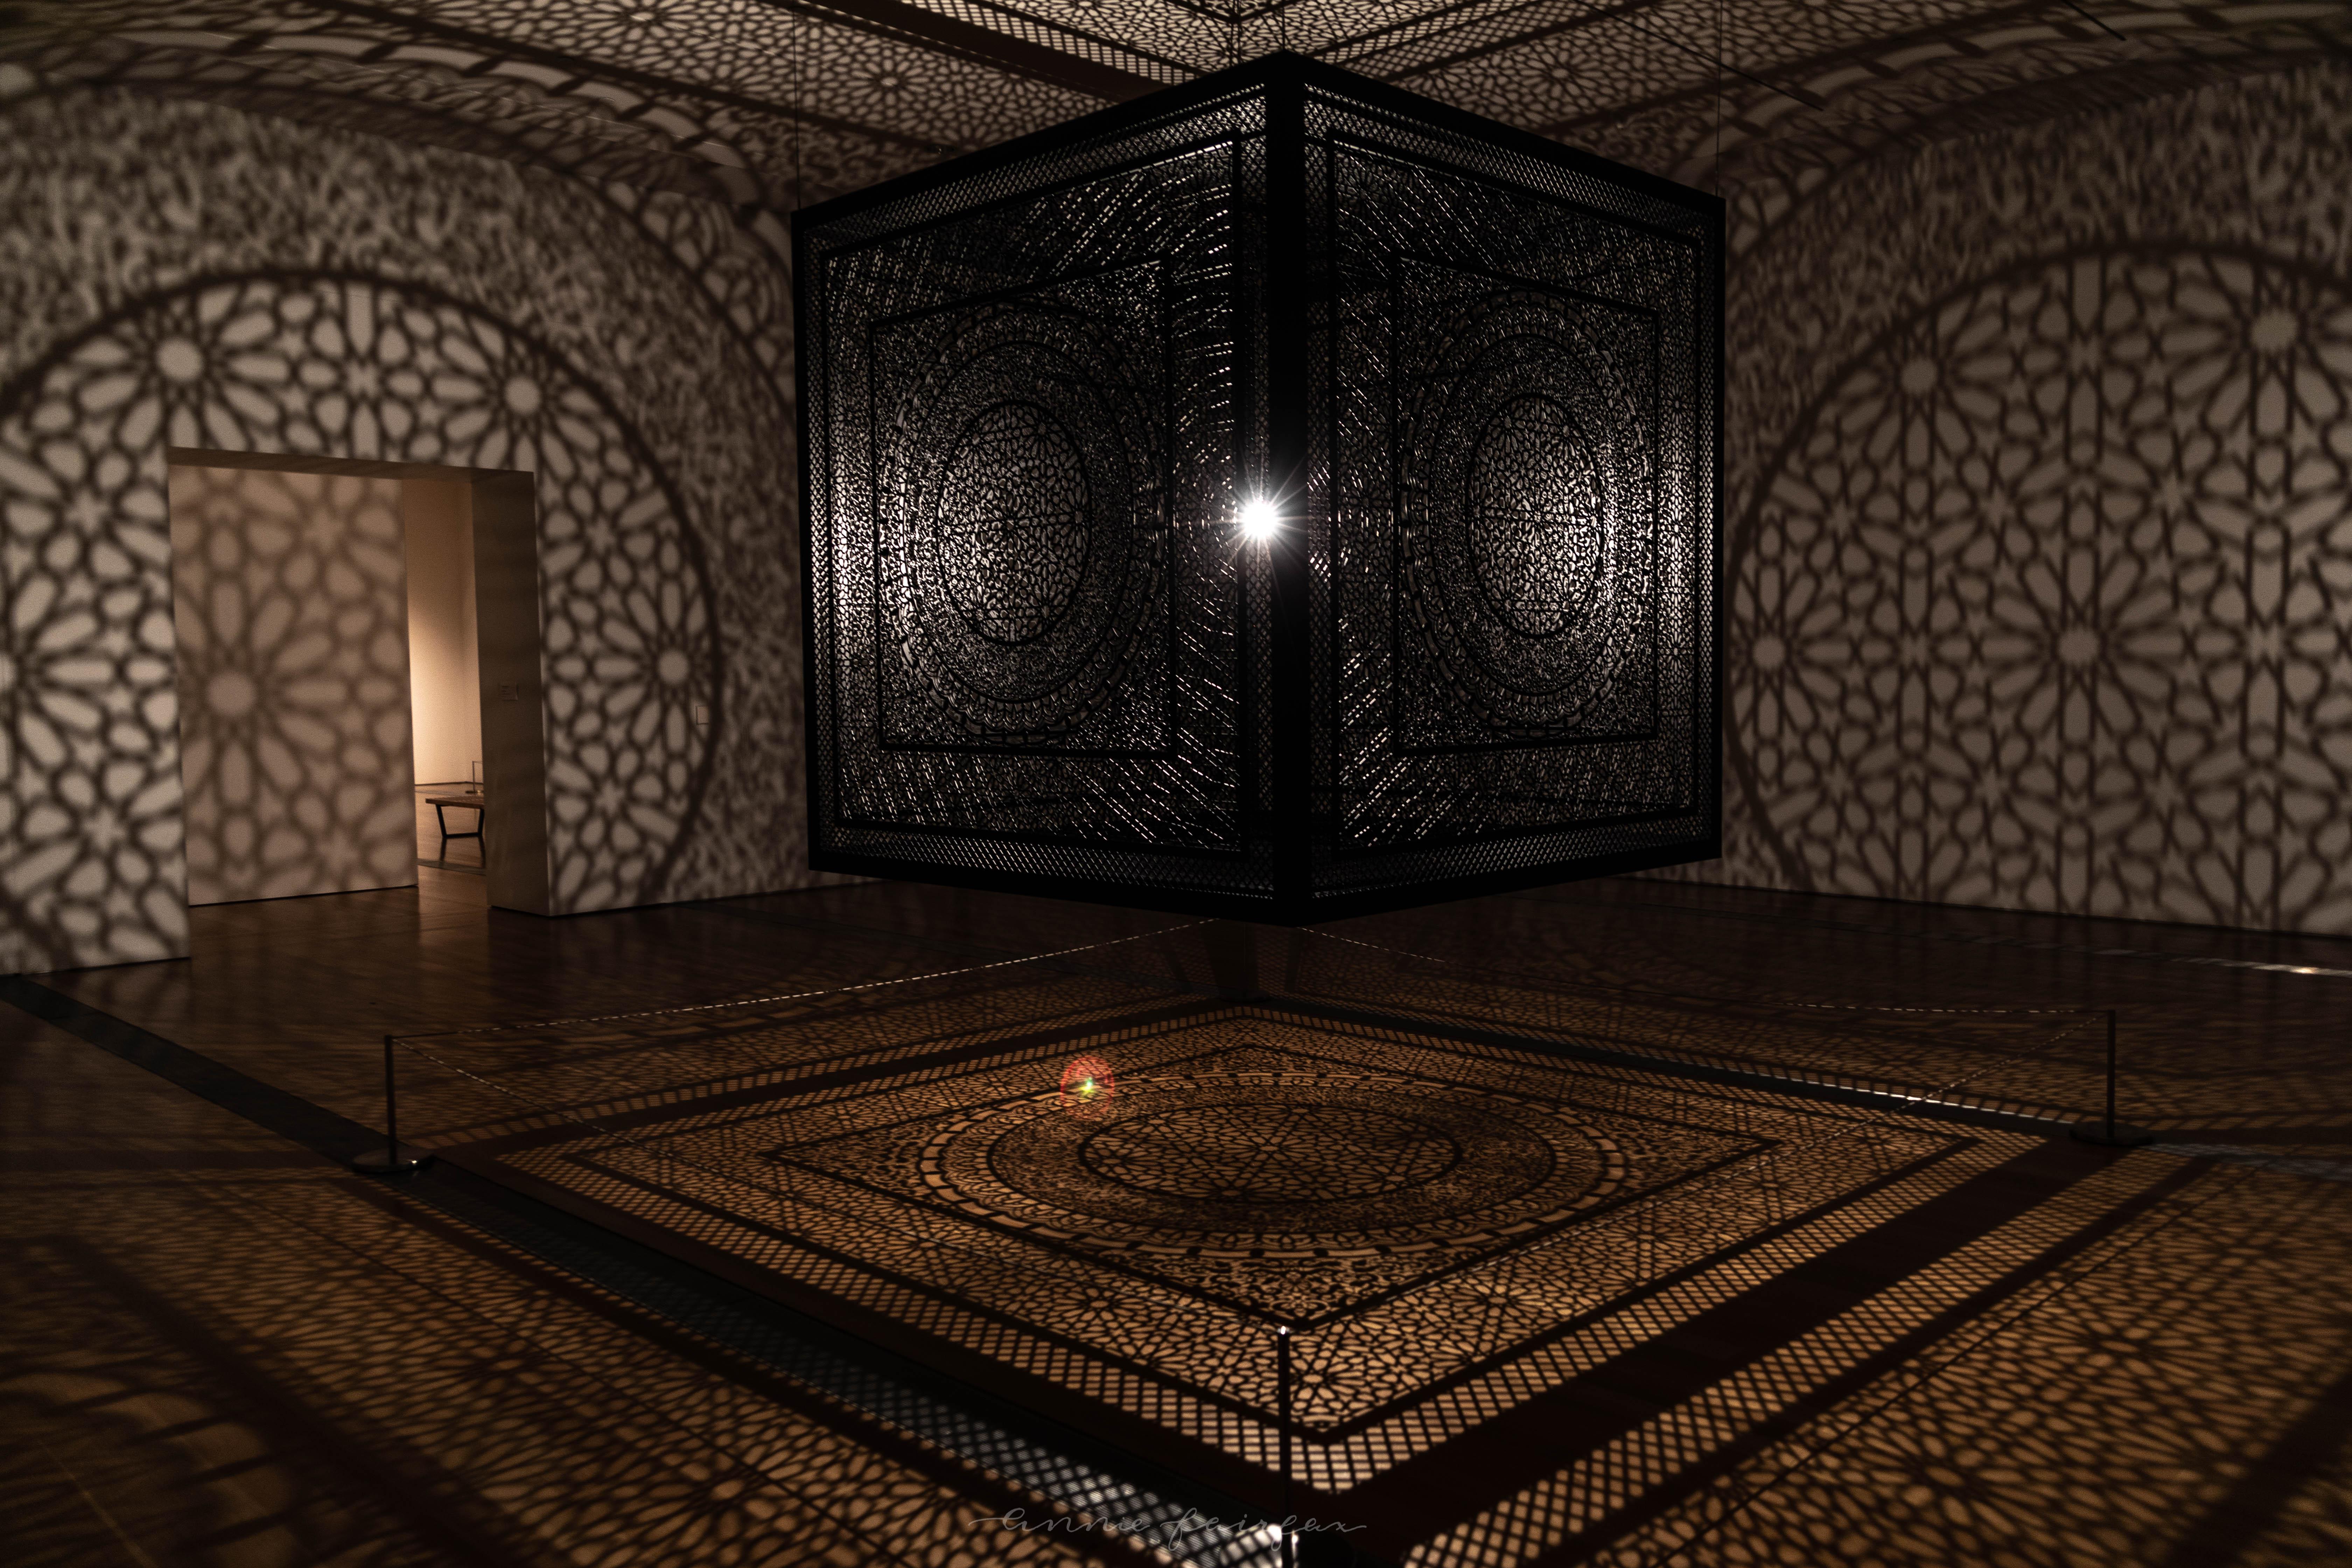 Anila Quayyum Agha: Intersections Grand Rapids Art Museum Art Prize Winner Shadows and Light Negative Space